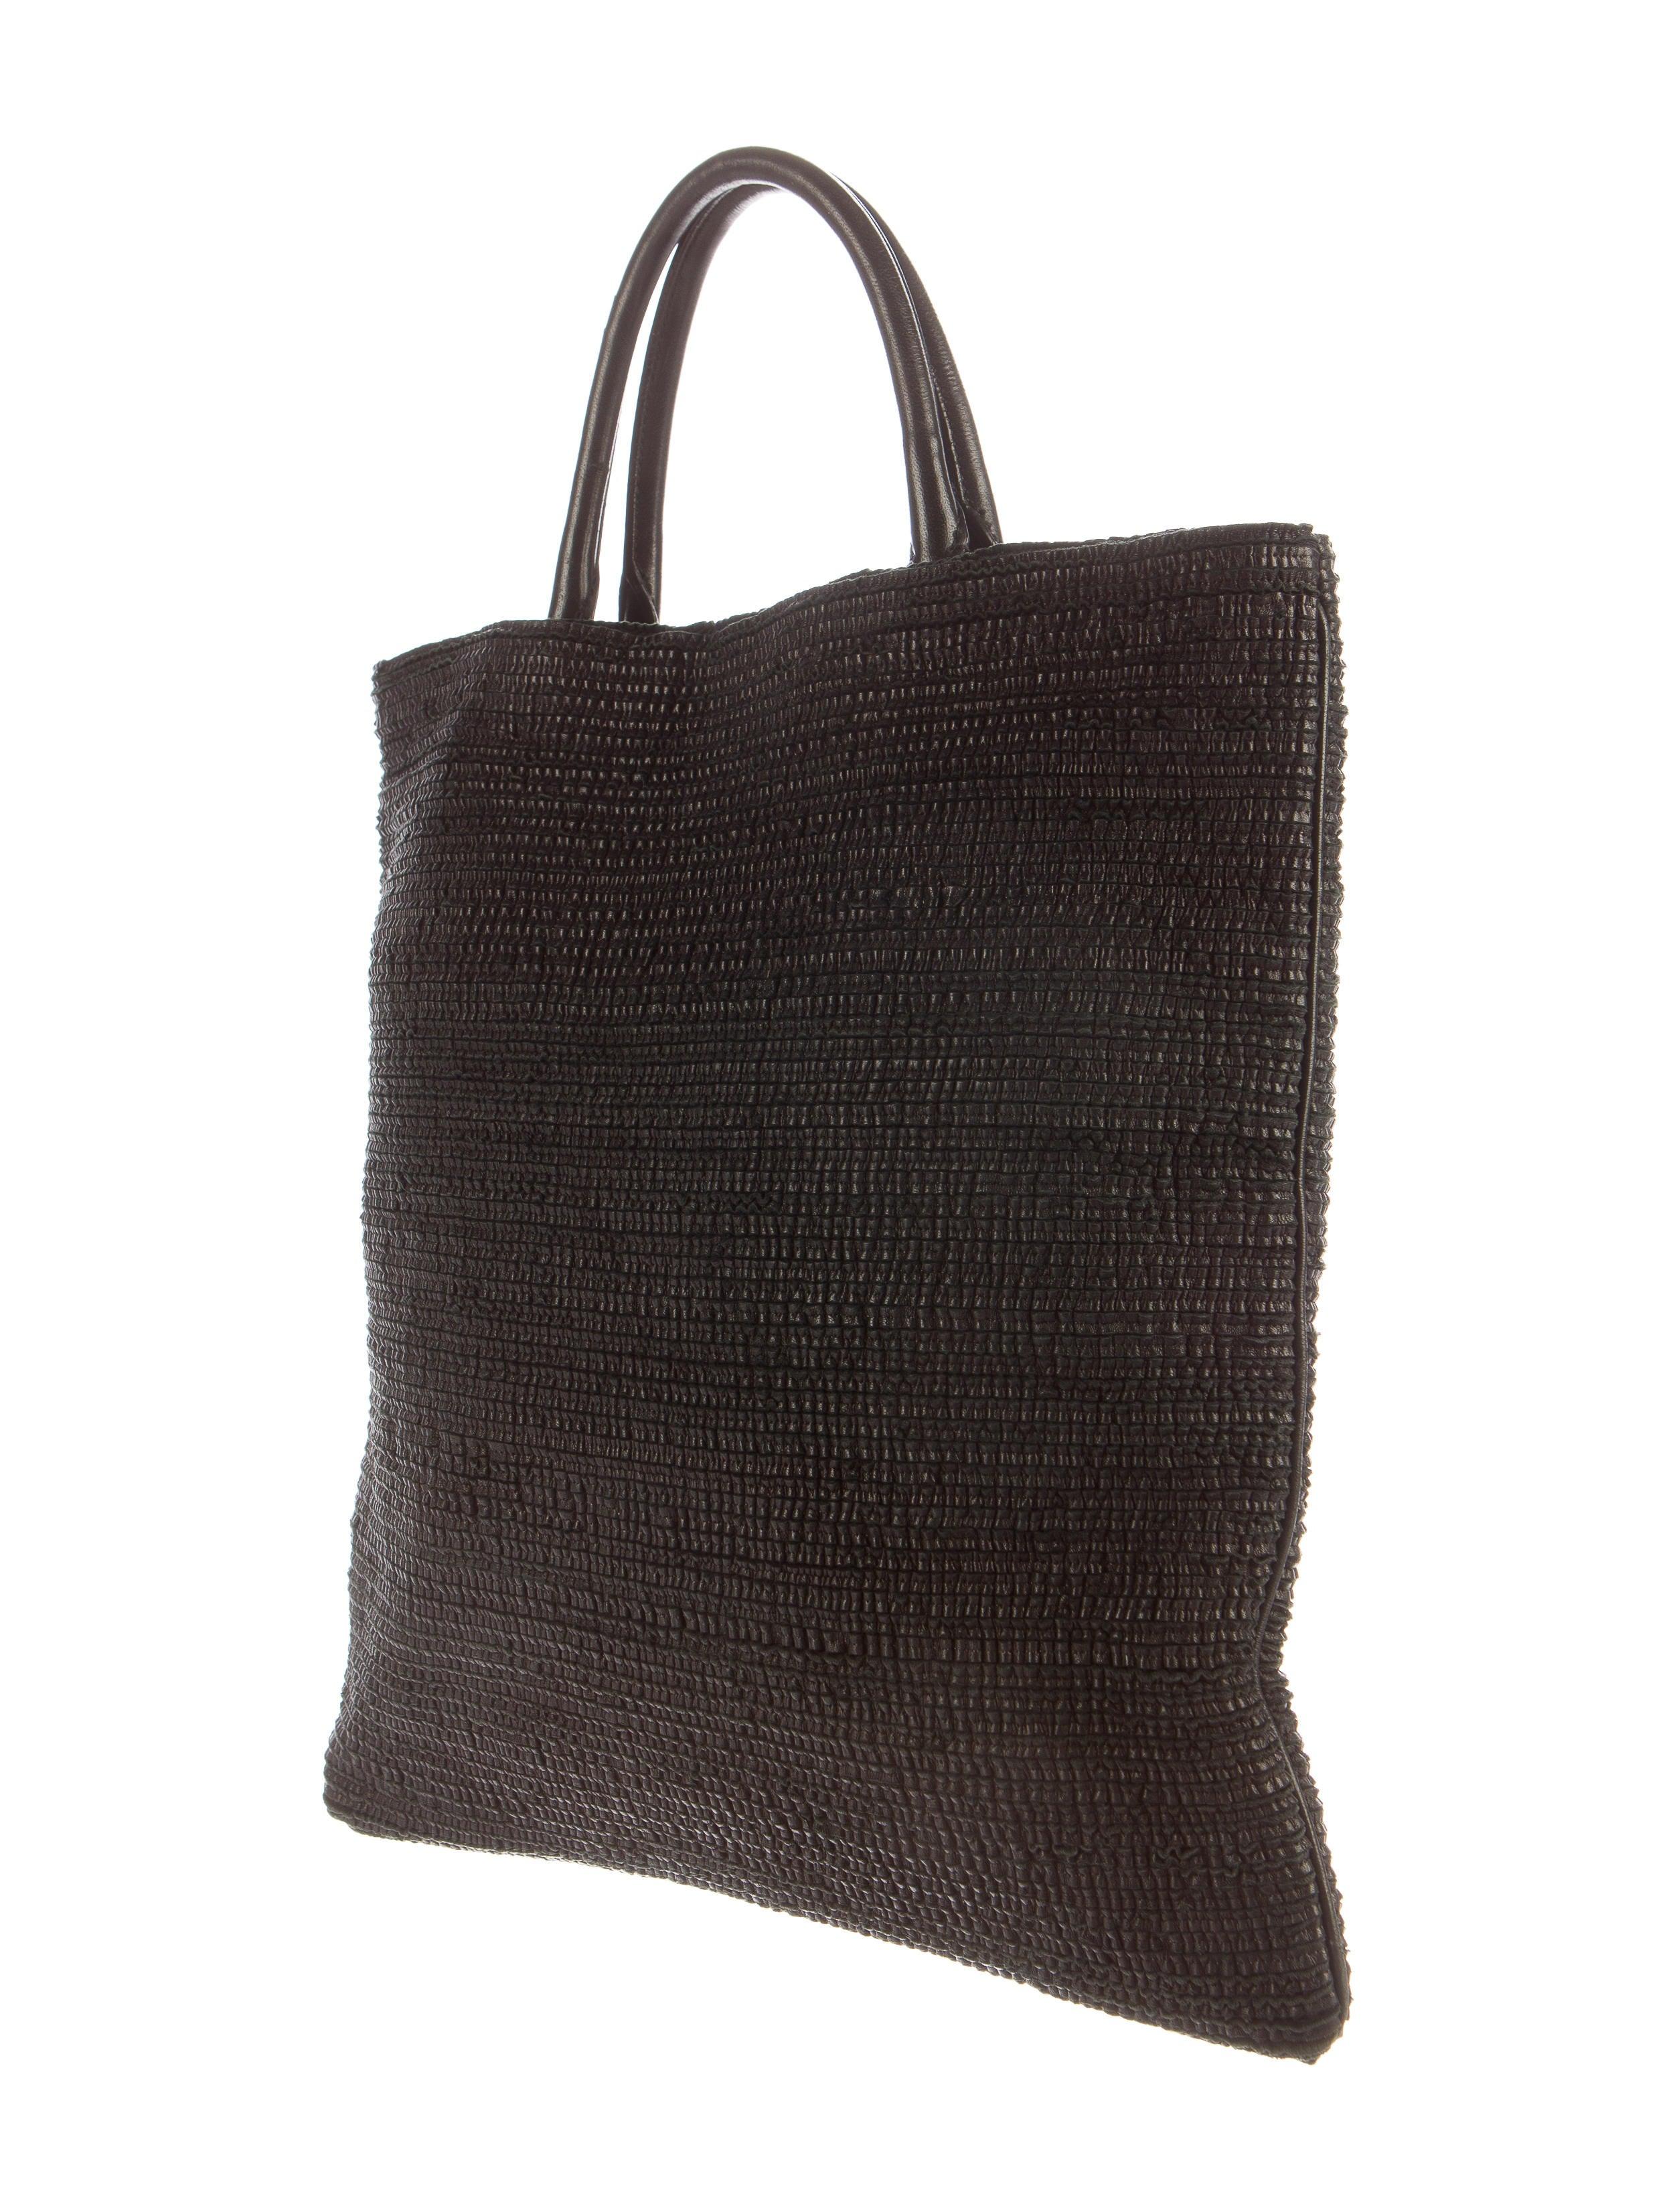 Contemporary Flatware Jil Sander Woven Leather Tote Handbags Jil36663 The